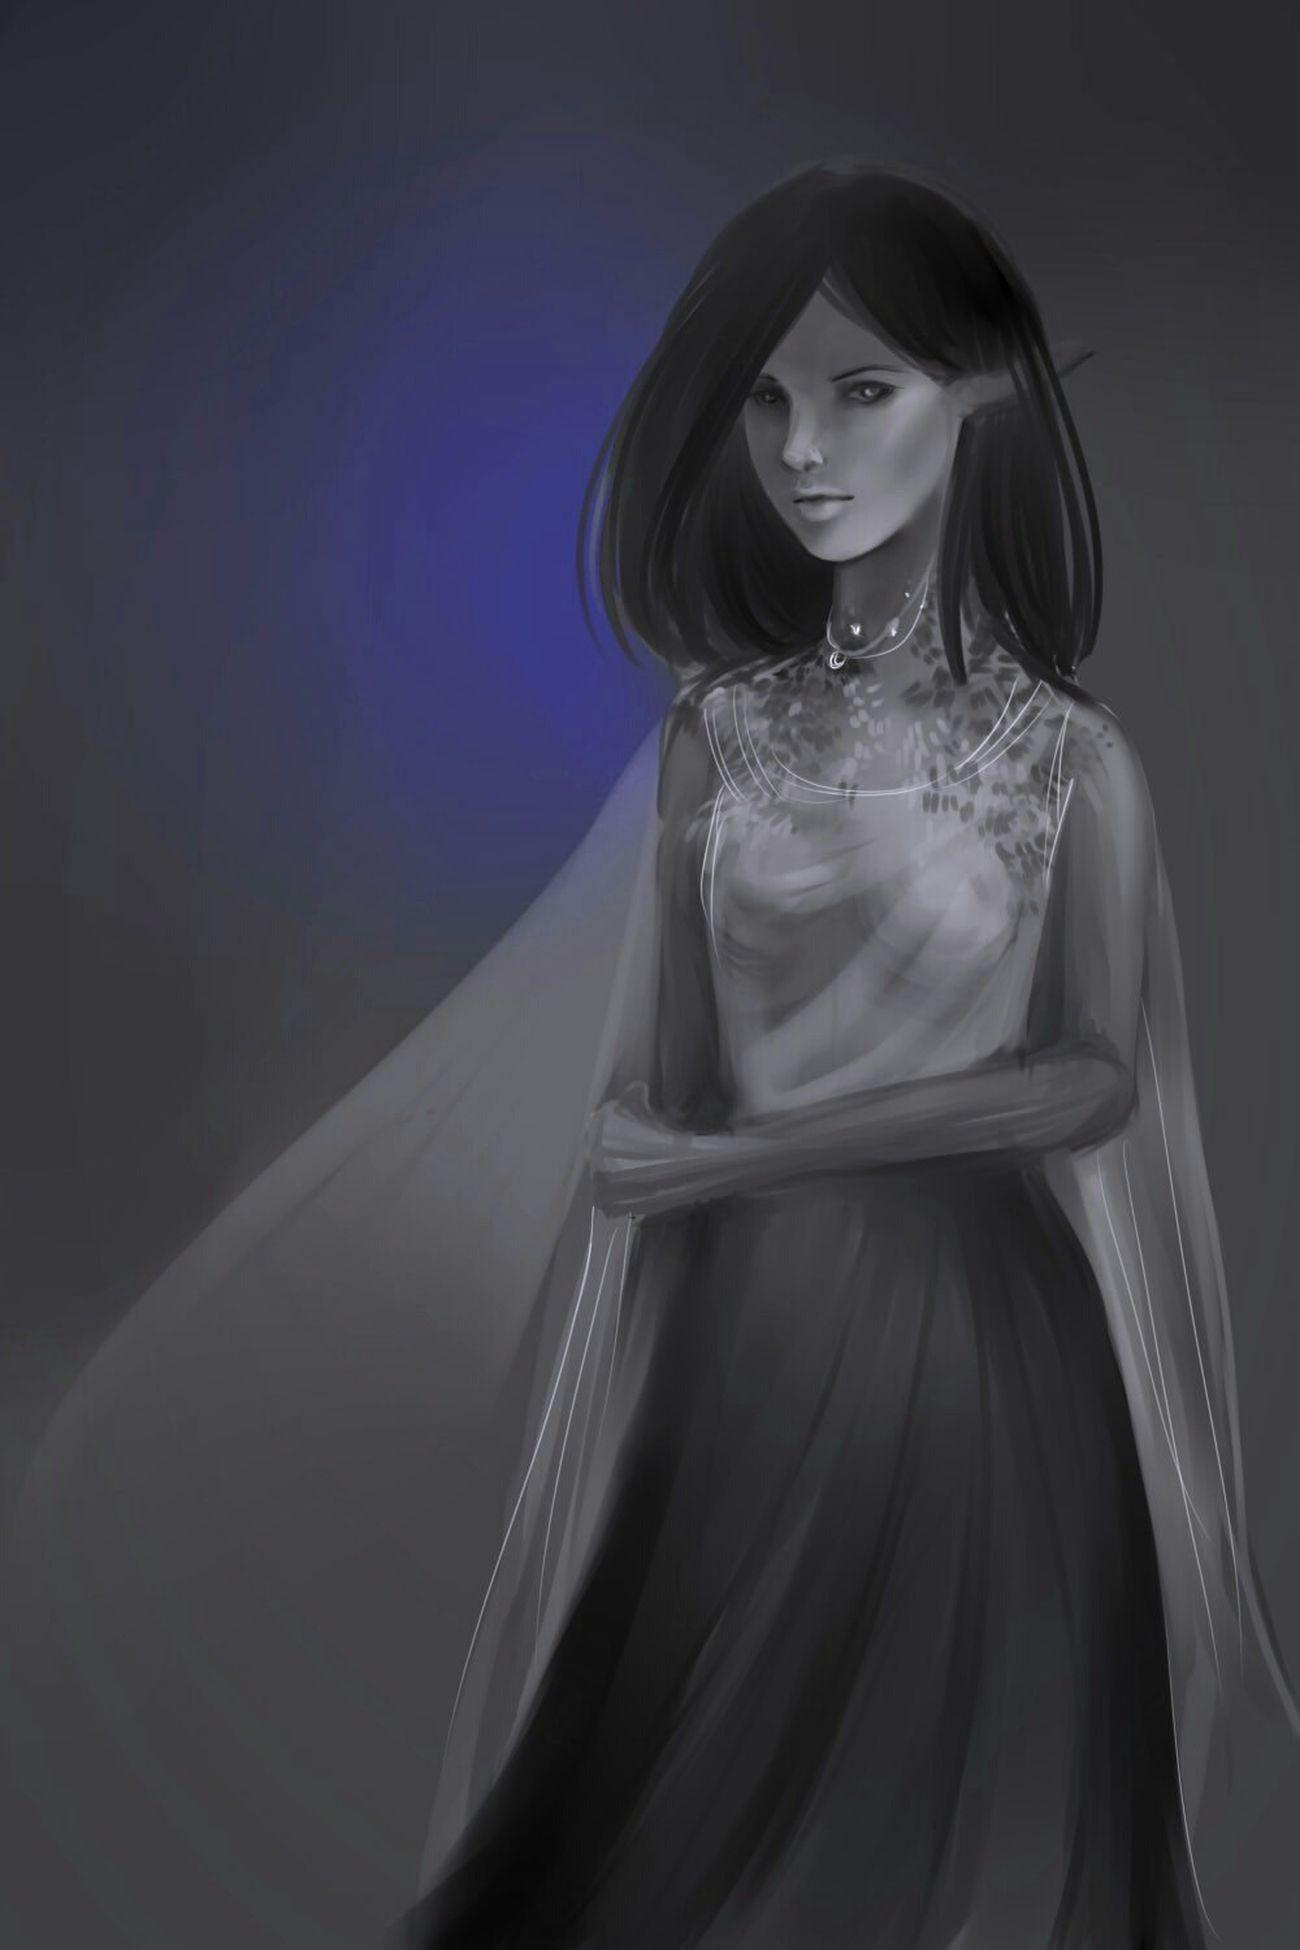 Verida Dartadon Sallon Drawing Art Love Drawing ❤ EyeEm Gallery Art Gallery Picture ArtWork Anime